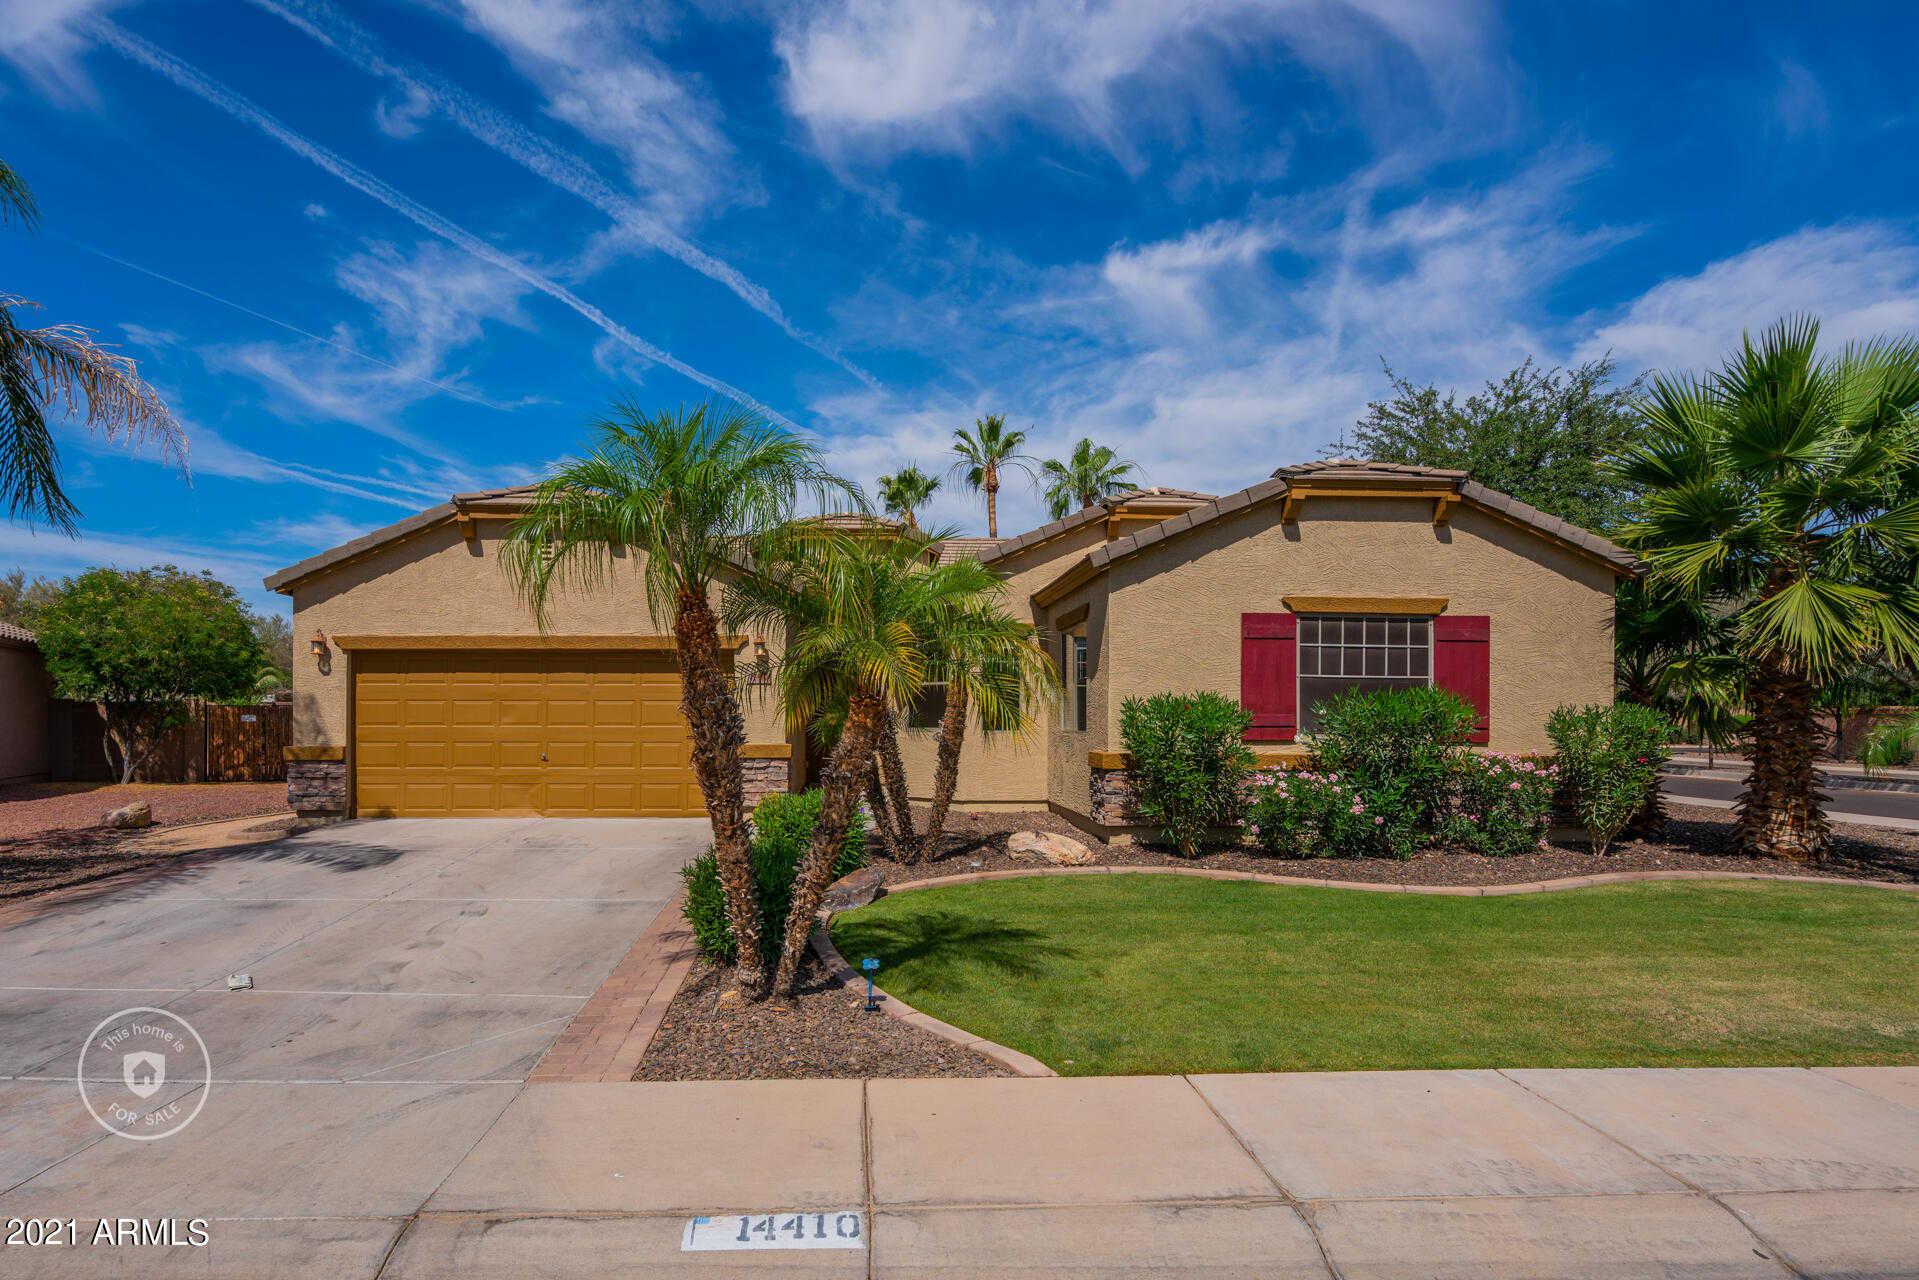 $510,000 - 4Br/3Ba - Home for Sale in Sierra Montana Parcel 11, Surprise